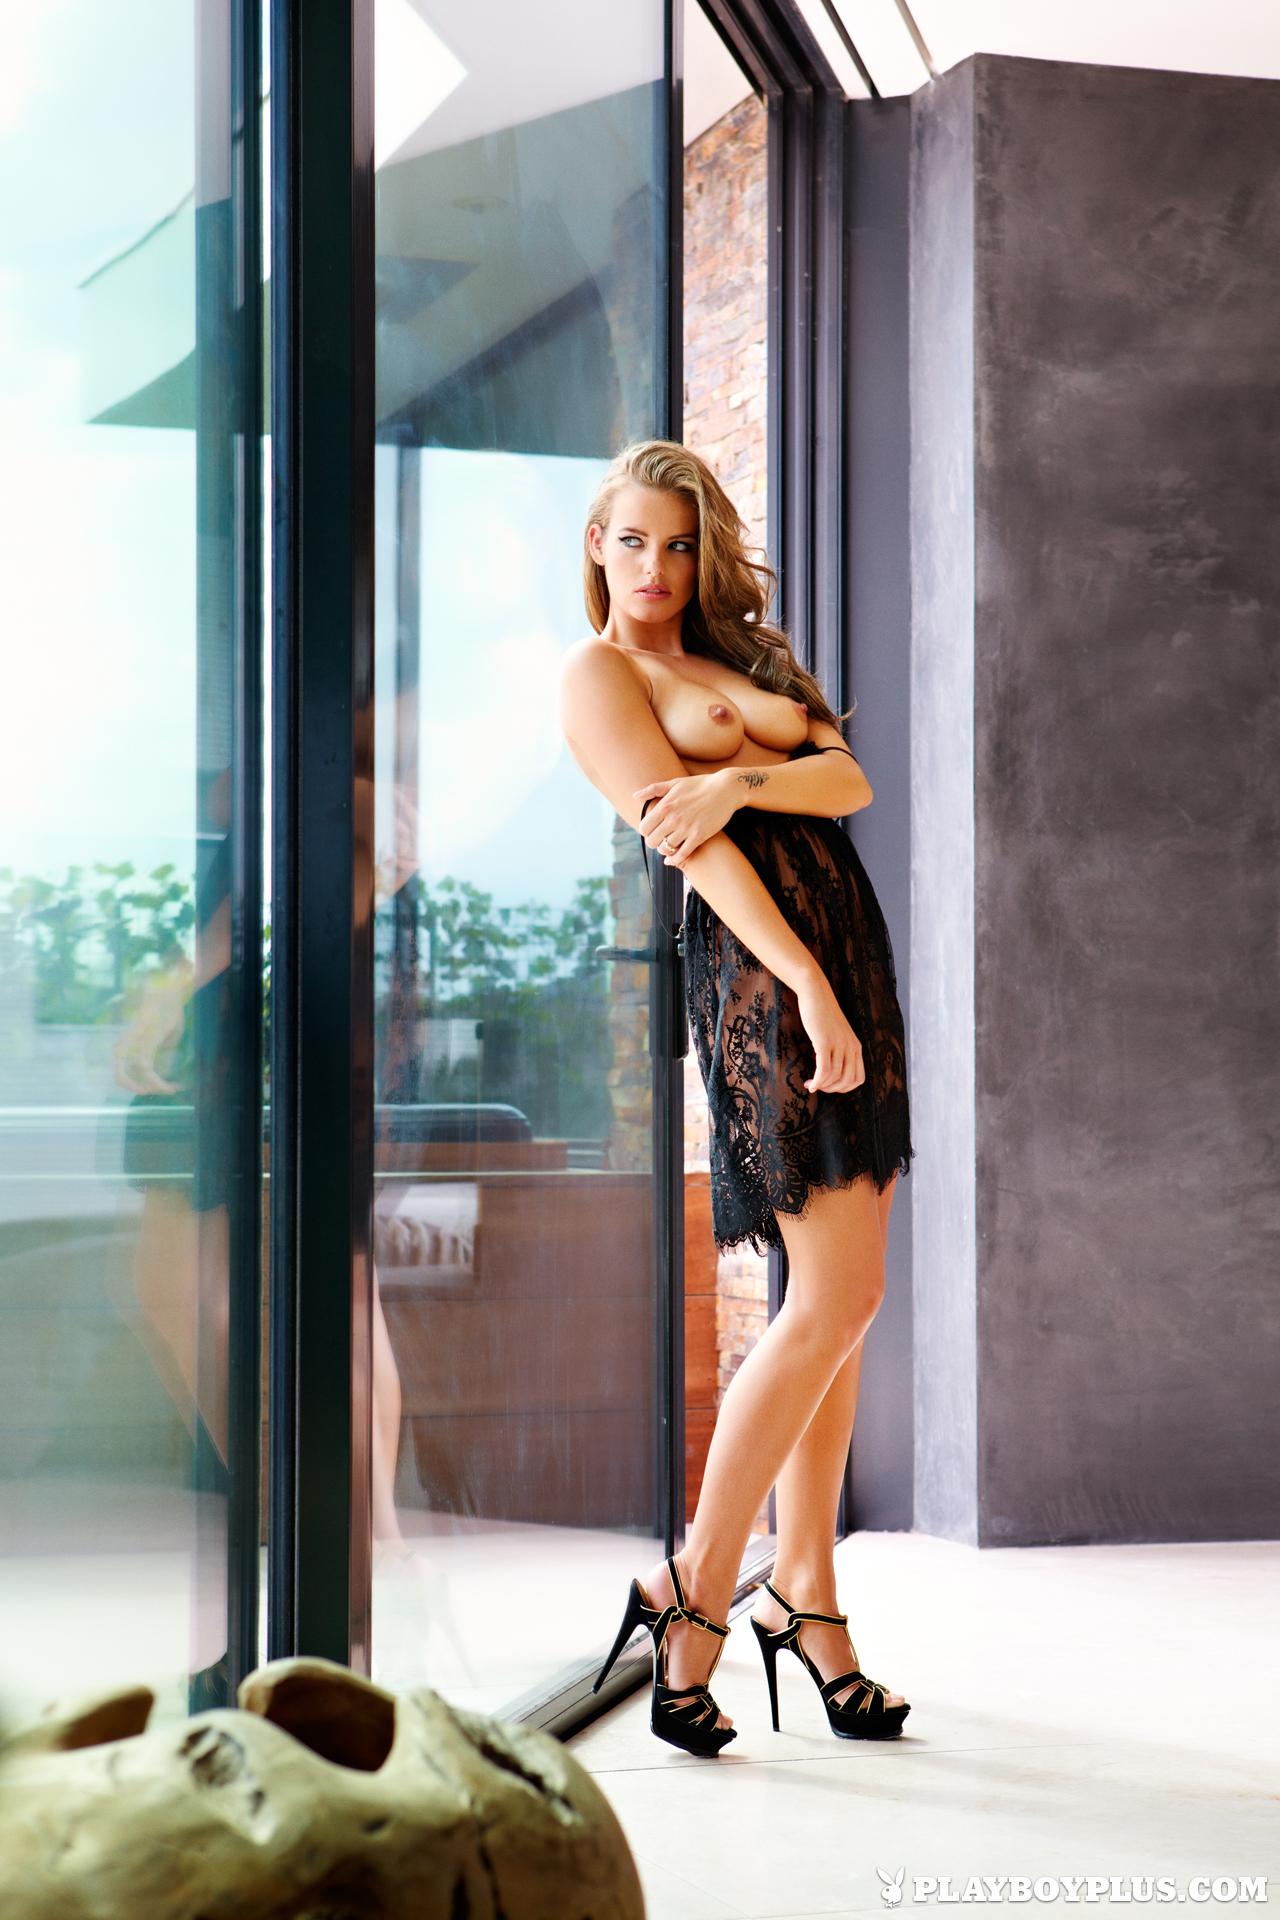 Beau Hesling in Playboy Netherlands - Centerfolds Blog